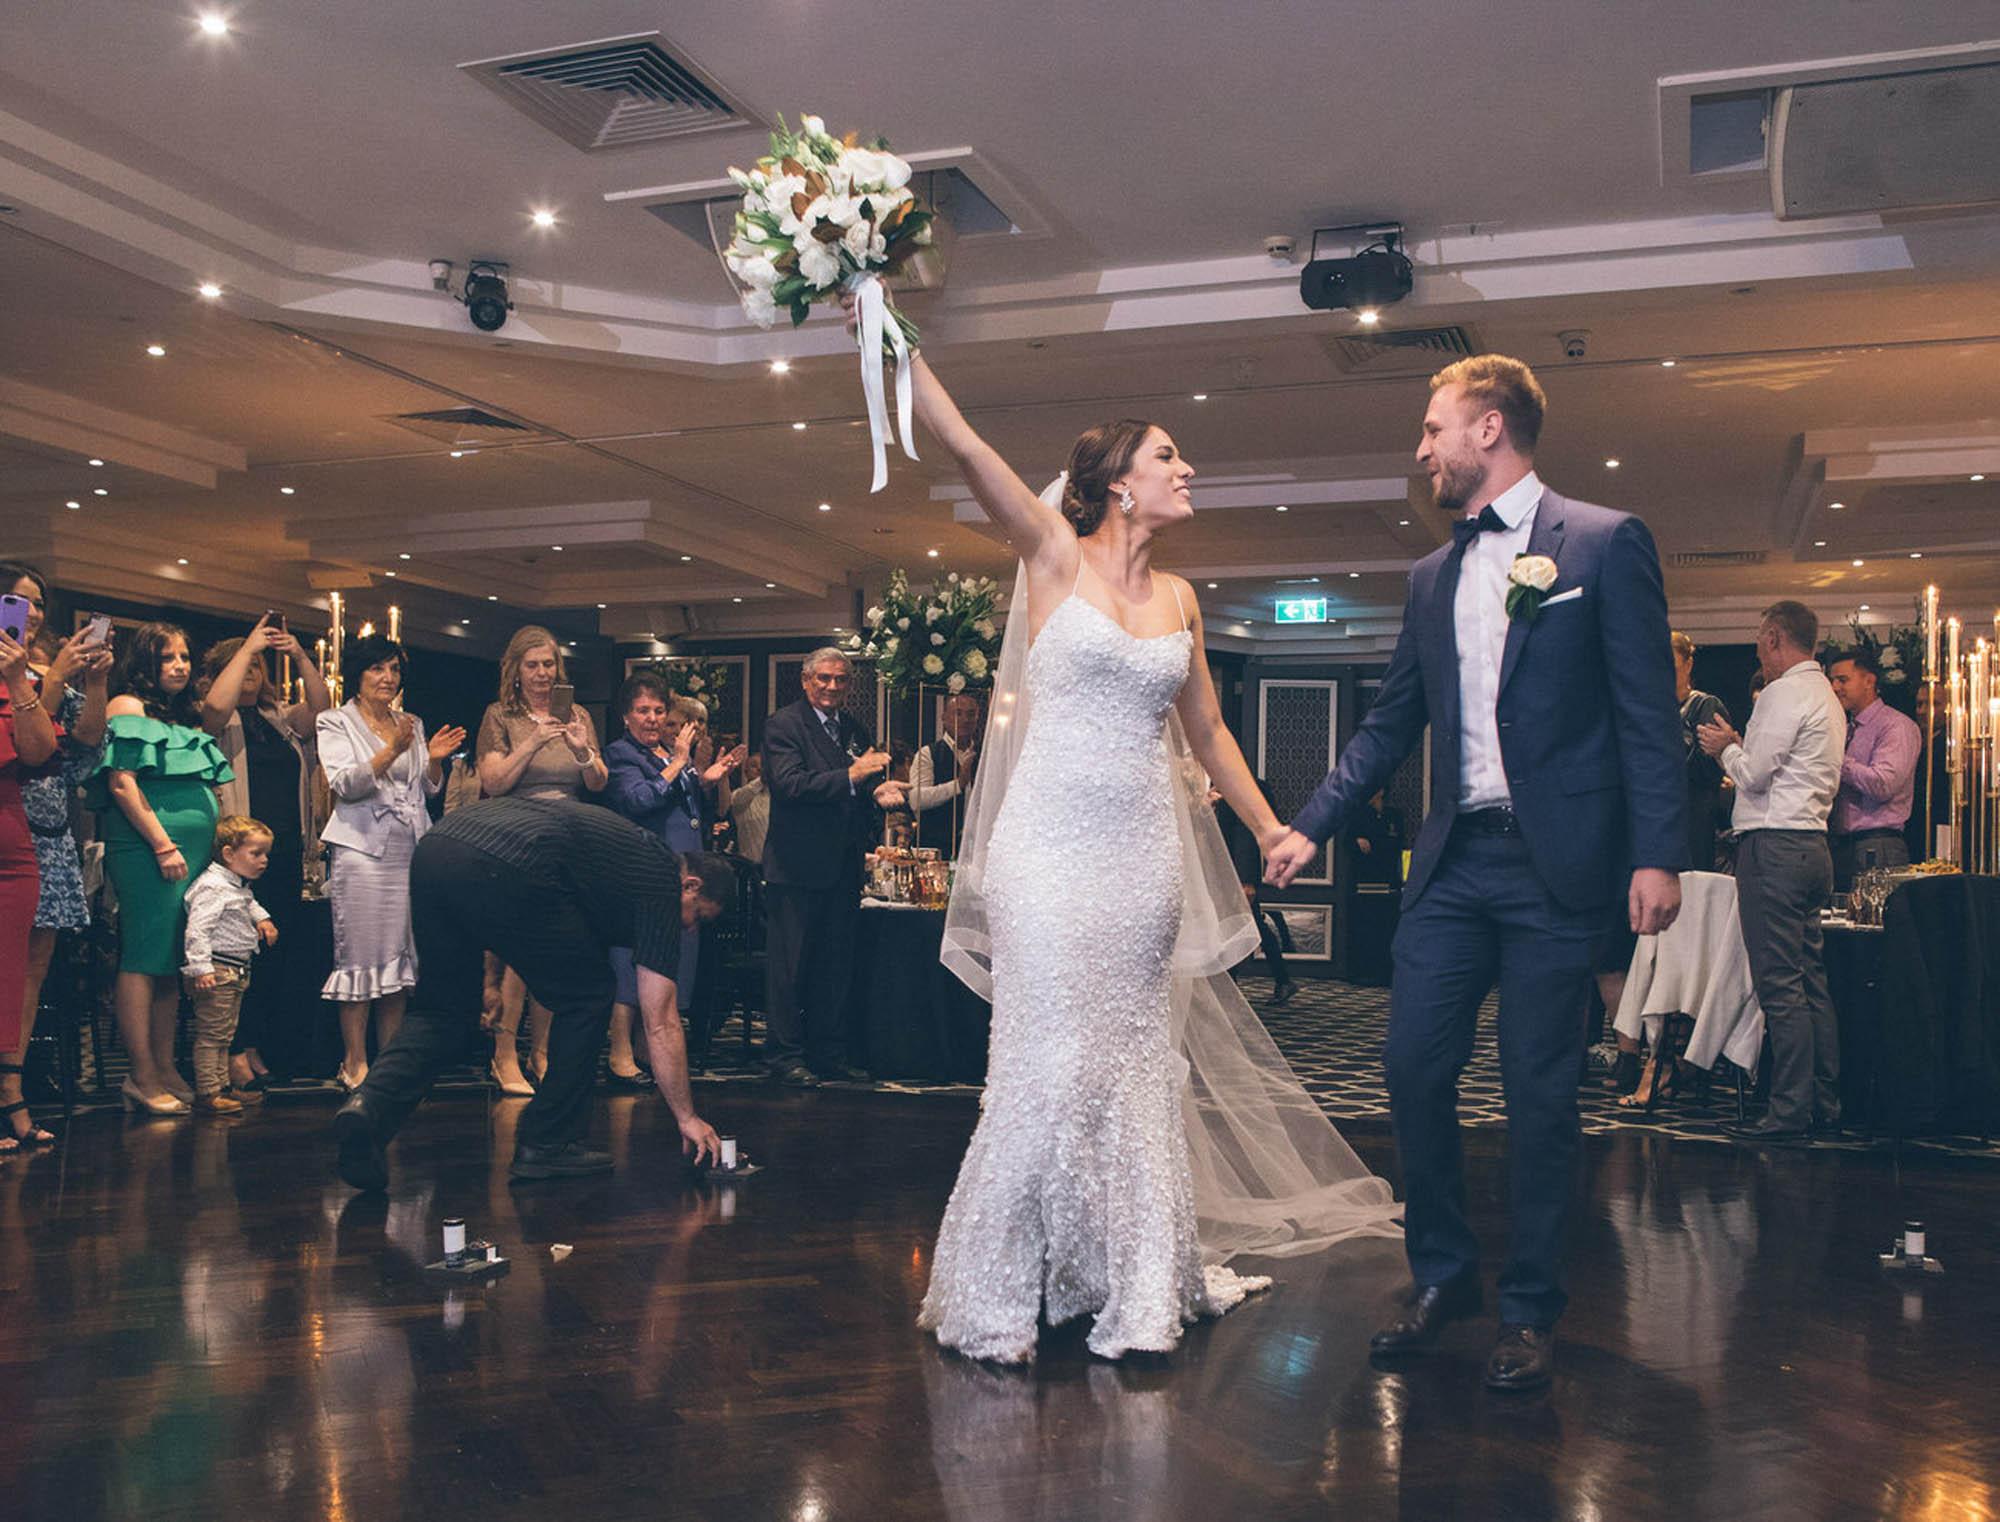 MacDougall-Photography-Sydney-Wedding-Photographers-87.jpg